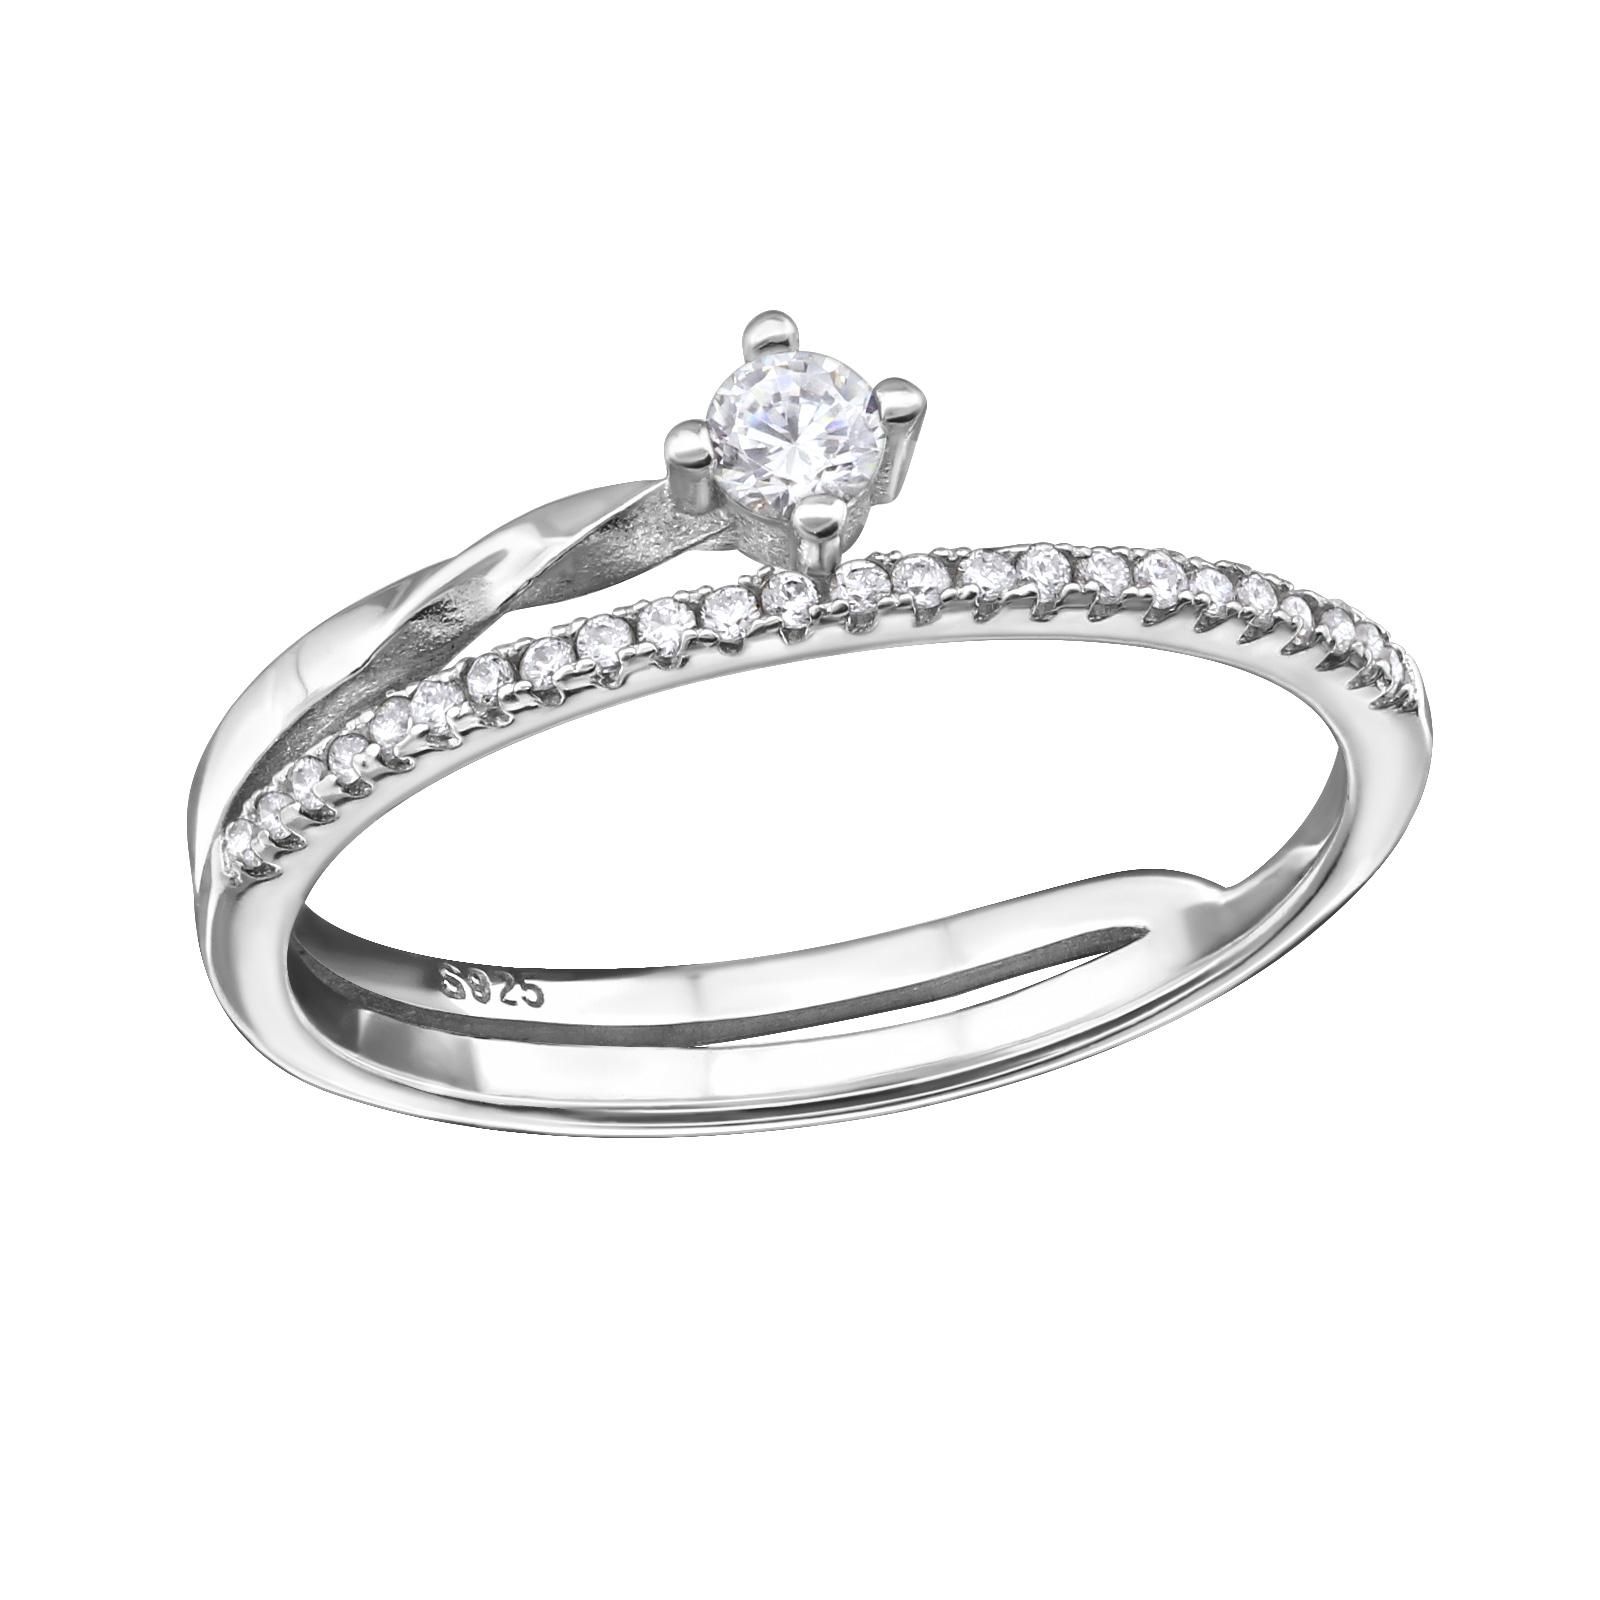 OLIVIE Stříbrný zatočený prsten 0662 Velikost: 8 (EU: 57 - 58)